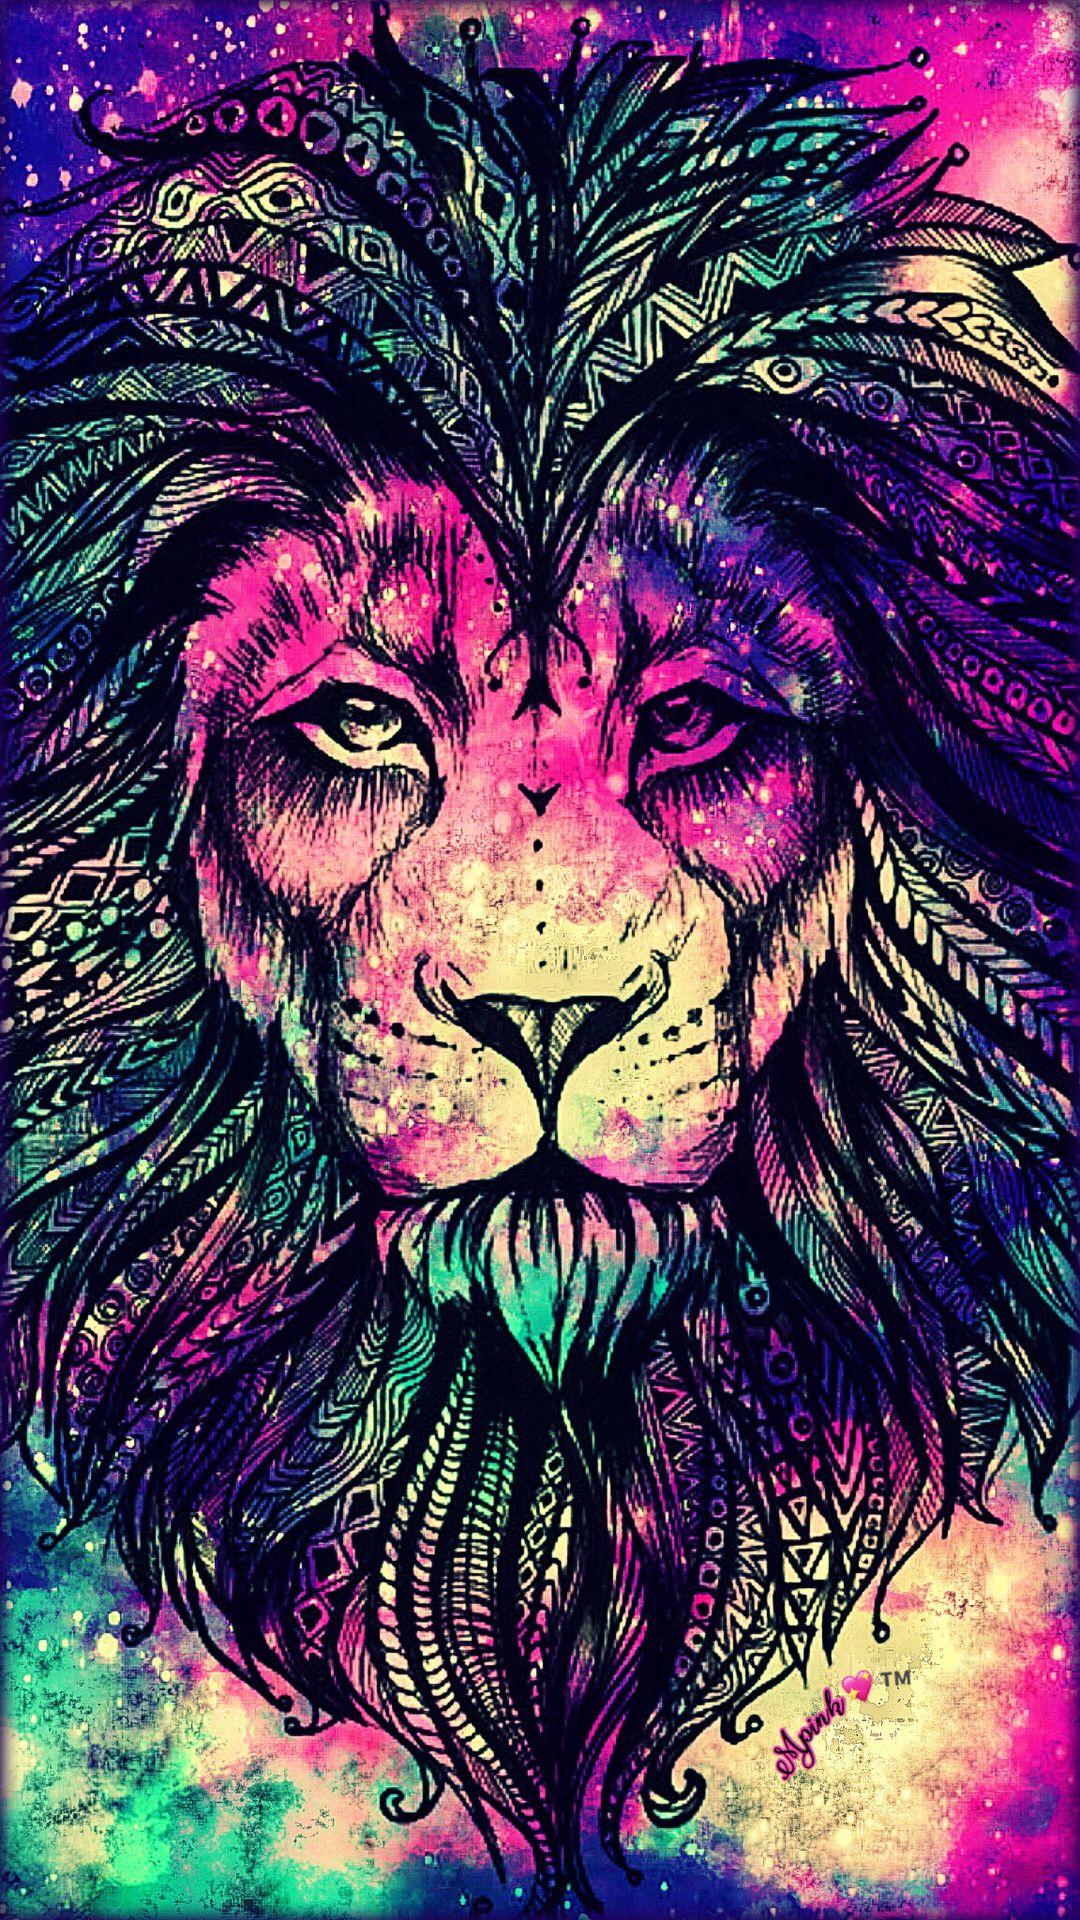 Rainbow Lion Galaxy Wallpaper Androidwallpaper Iphonewallpaper Wallpaper Galaxy Sparkle Glitter Lockscreen Colorful Lion Lion Wallpaper Animal Wallpaper